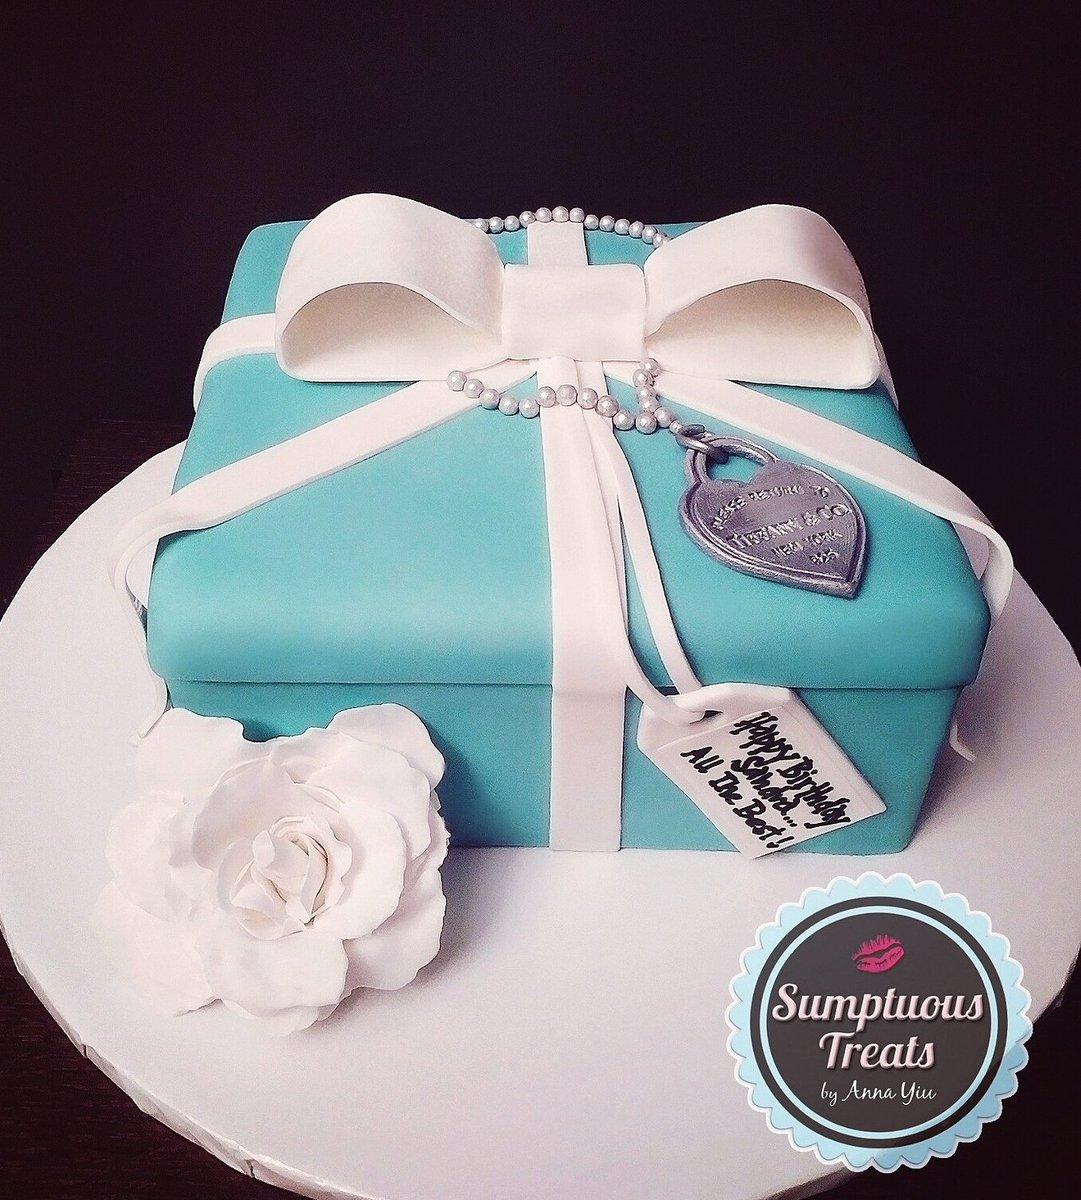 Prime Sumptuous Treats On Twitter Tiffany Co Inspired Gift Box Funny Birthday Cards Online Benoljebrpdamsfinfo